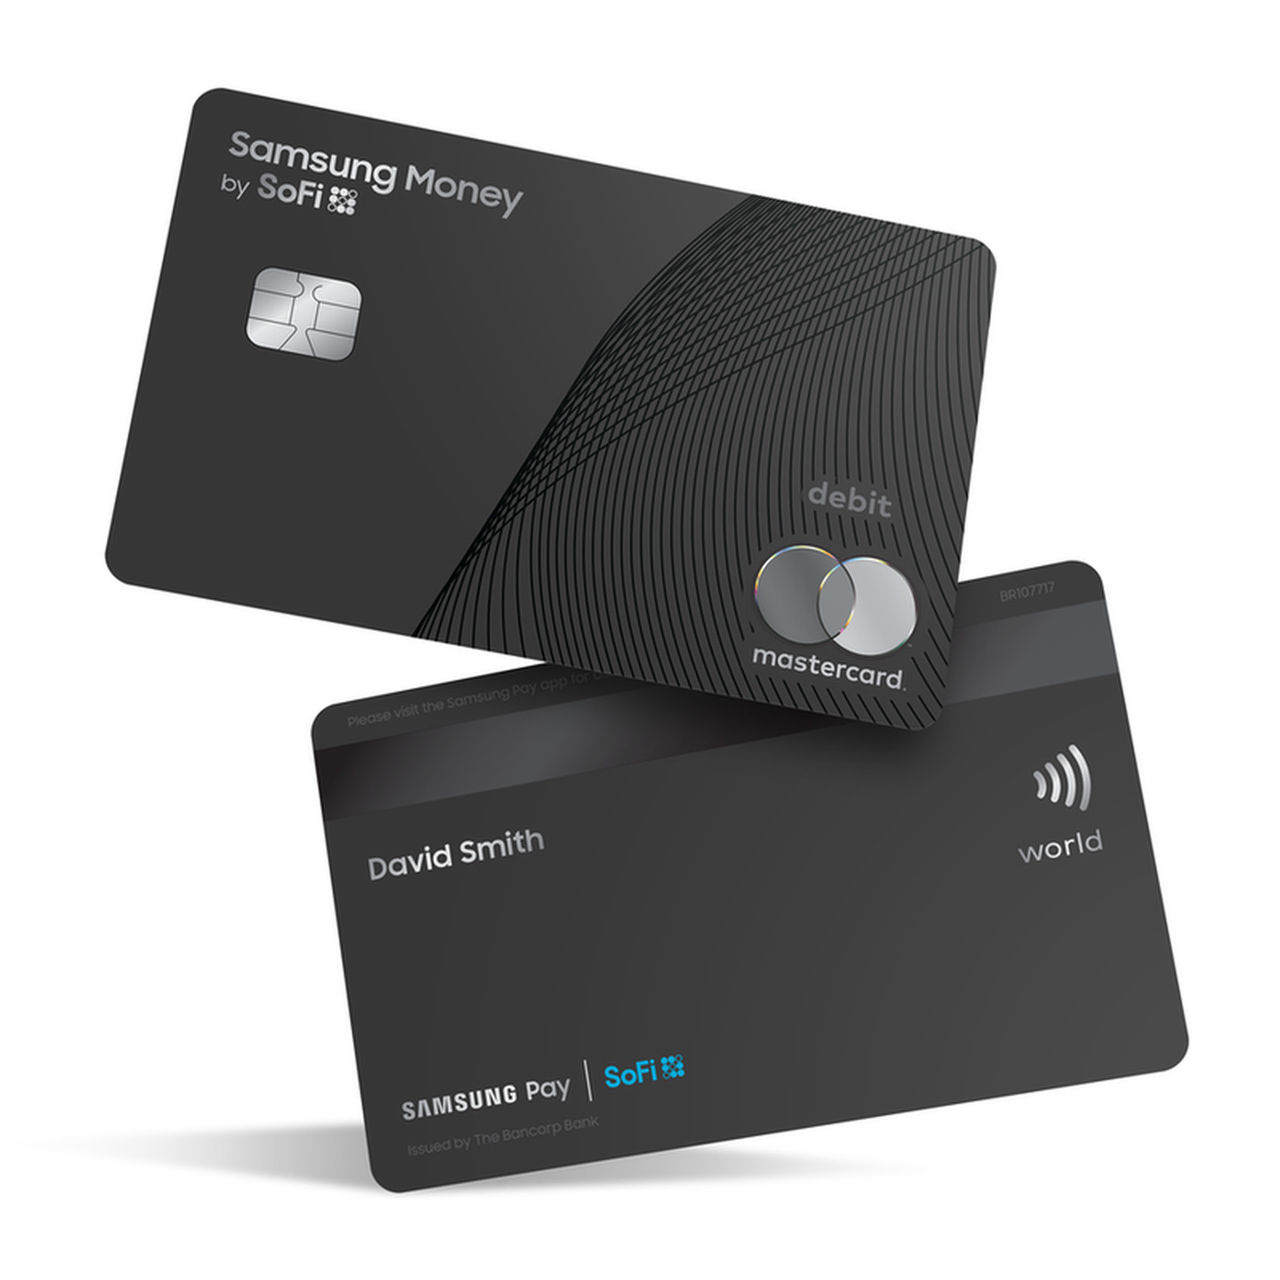 Samsung launches the Samsung Money debit card